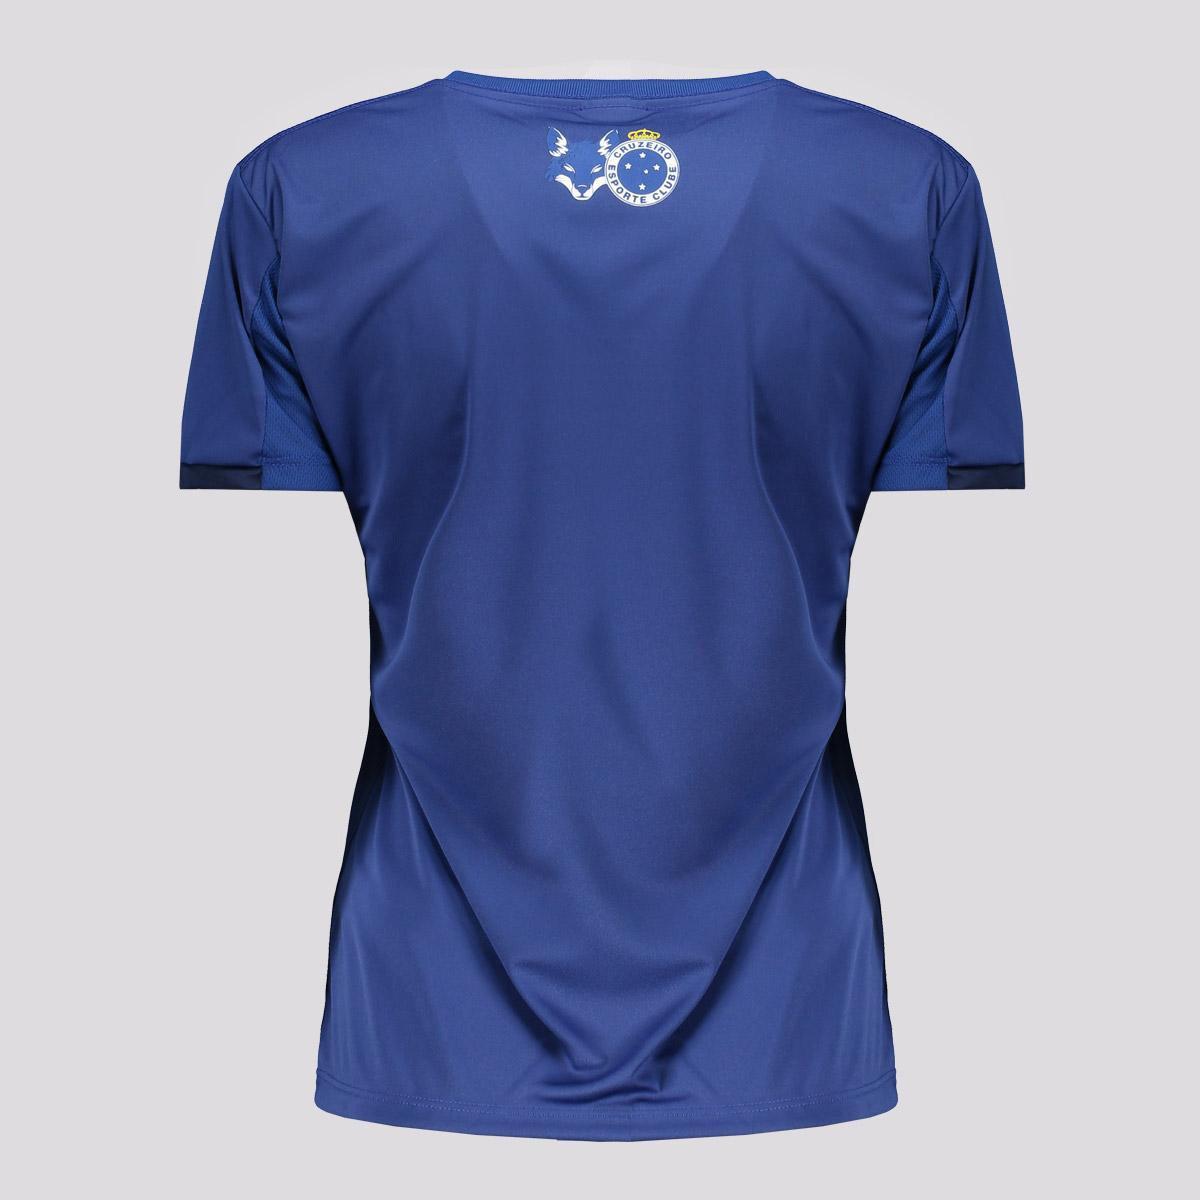 Camisa Feminina Cruzeiro Rub Oficial Licenciada